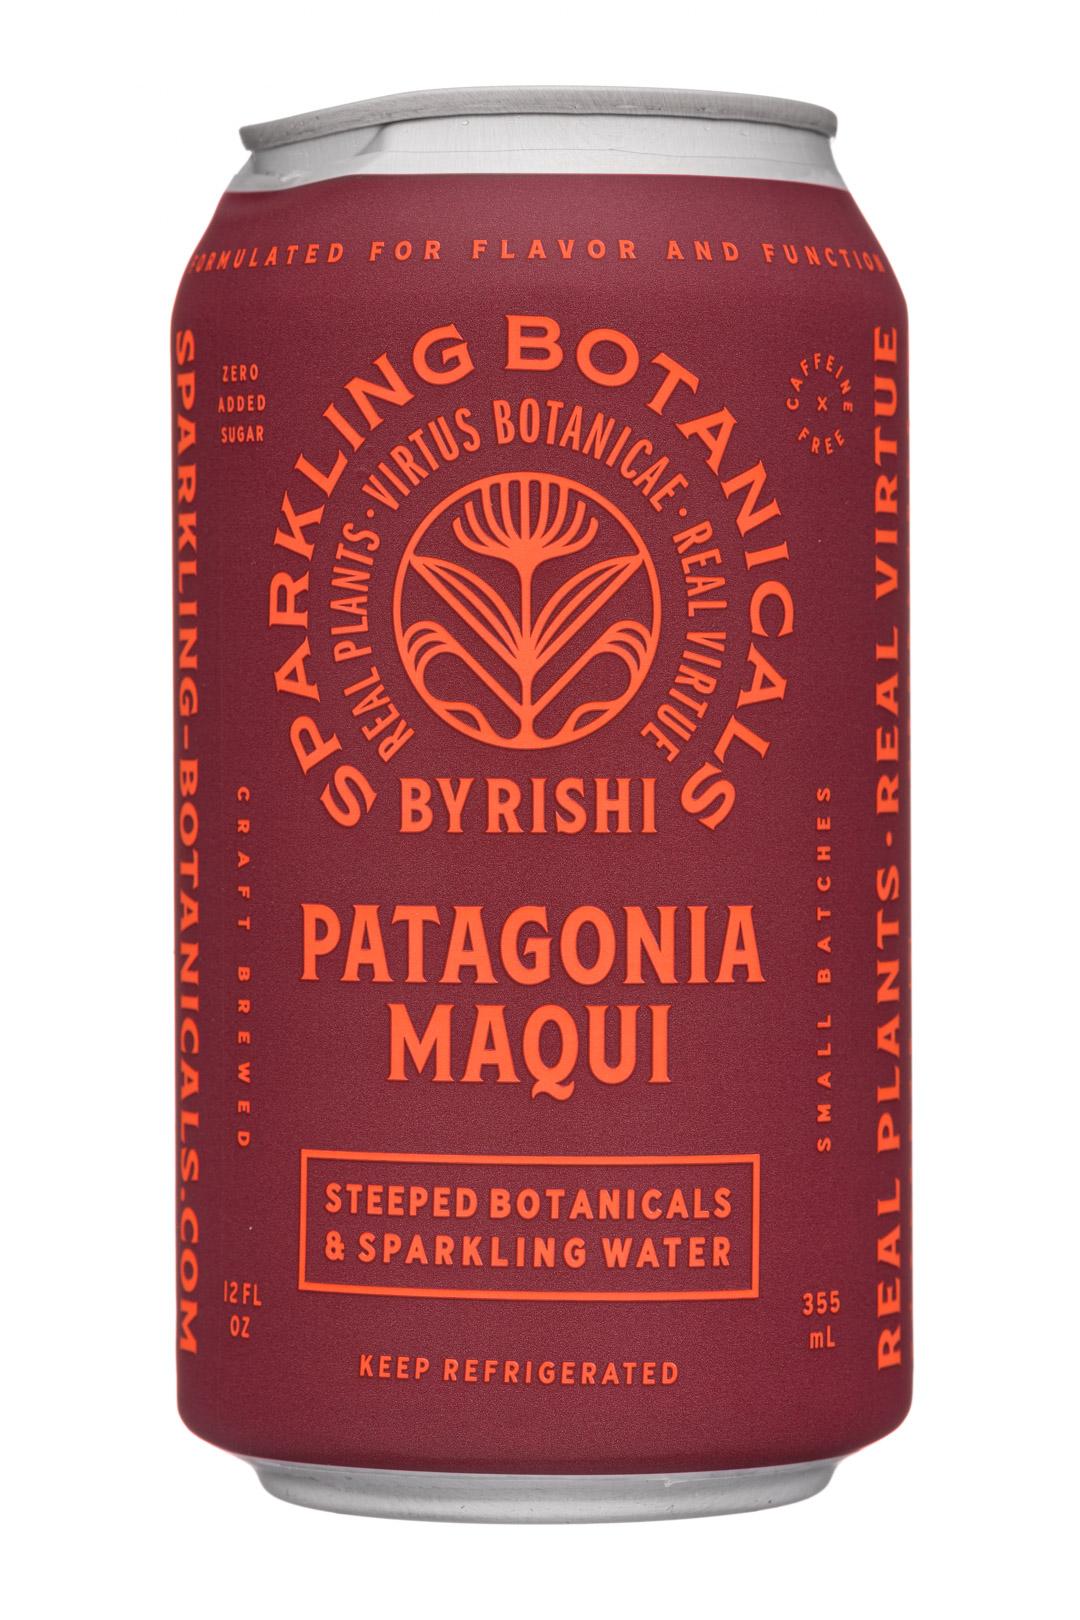 Patagonia Maqui